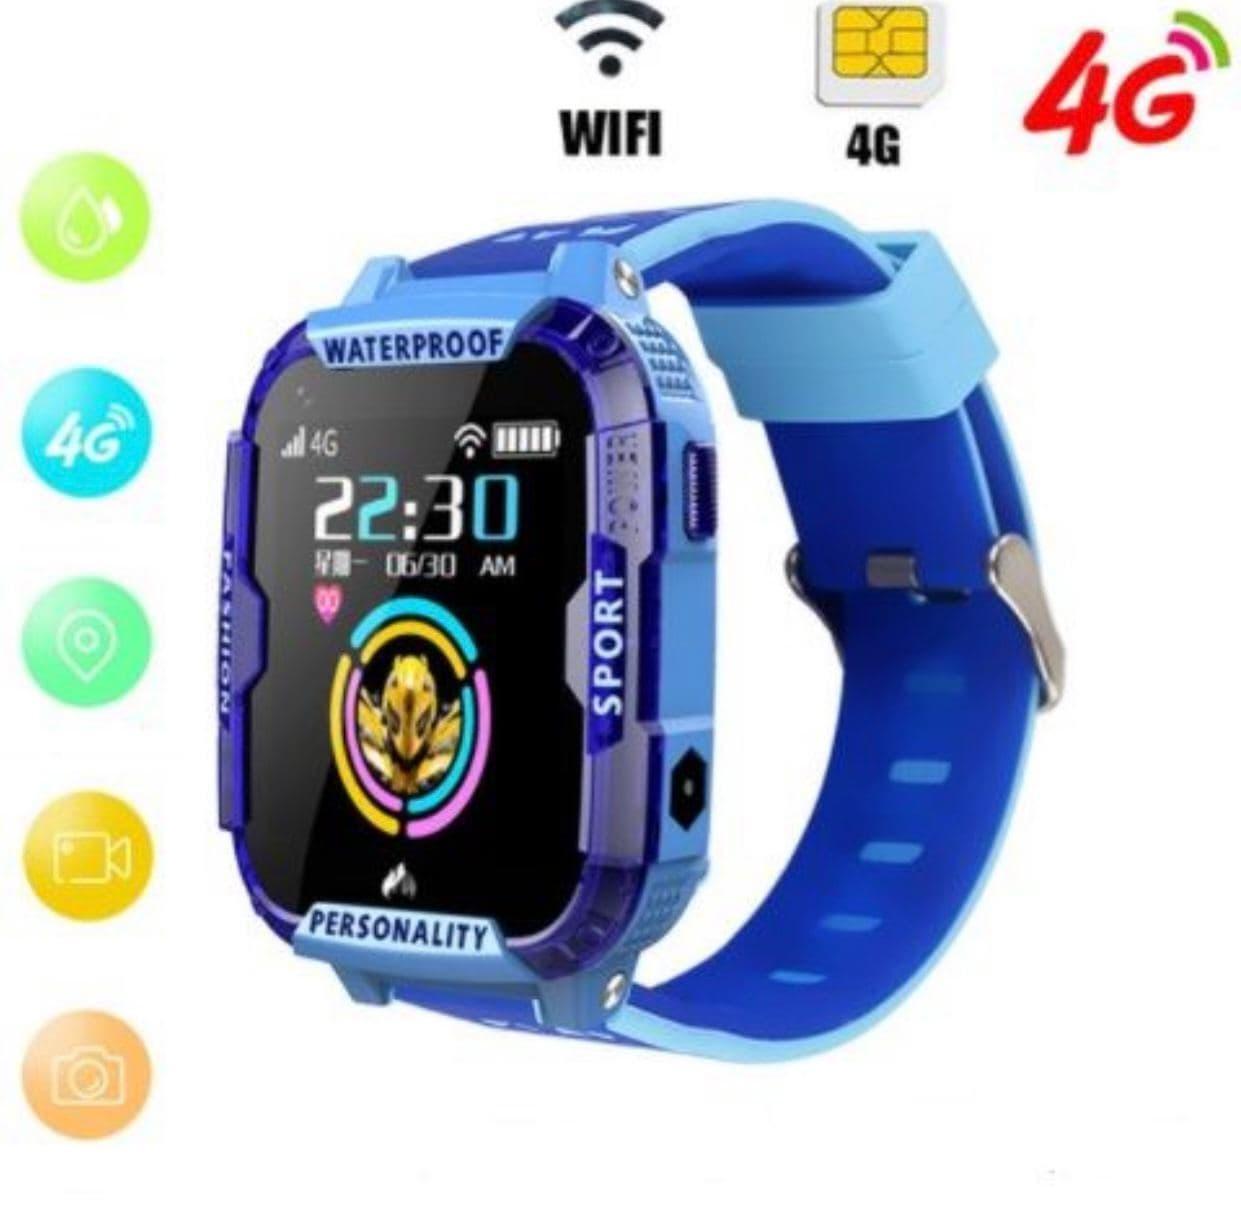 Умные детские часы Smart baby watch K22 Blue Android 6.0 4G видеочат GPS WiFi ip67